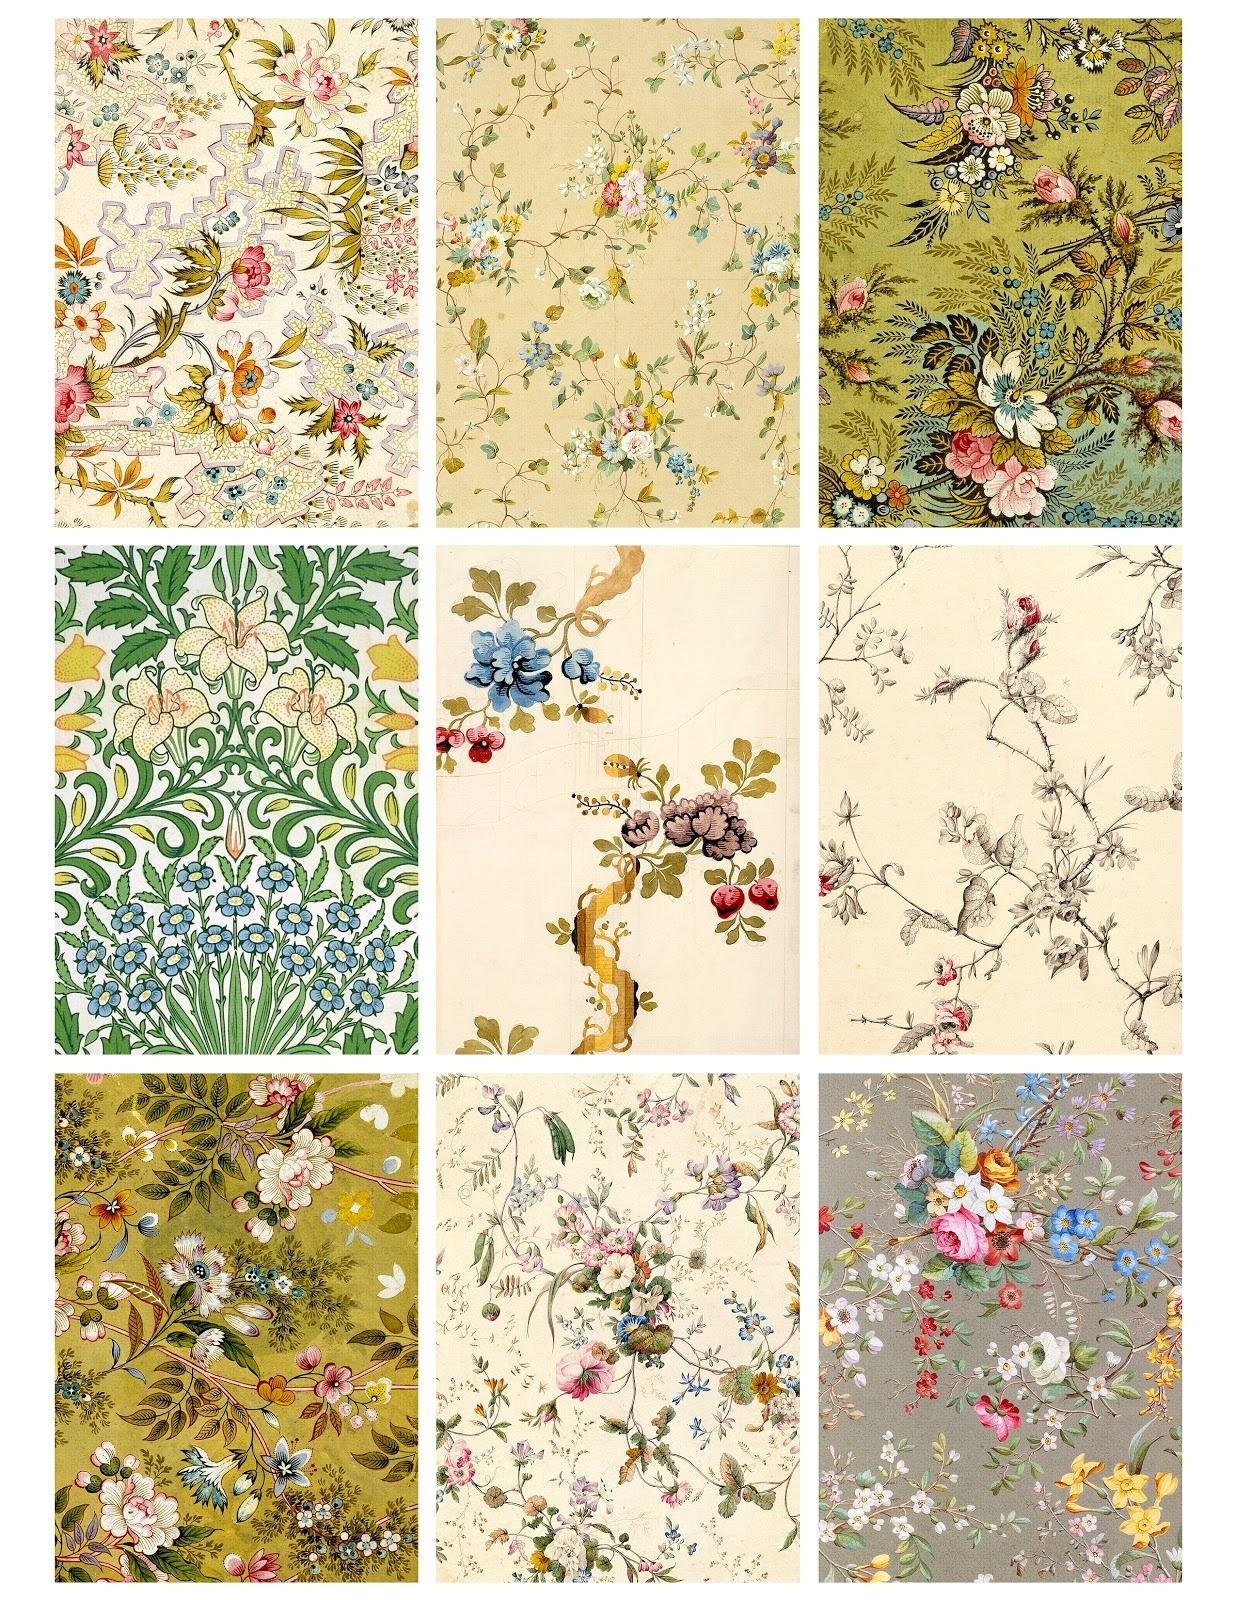 Free Printable Vintage Wallpaper - Wallpapersafari - Free Printable Wallpaper Patterns